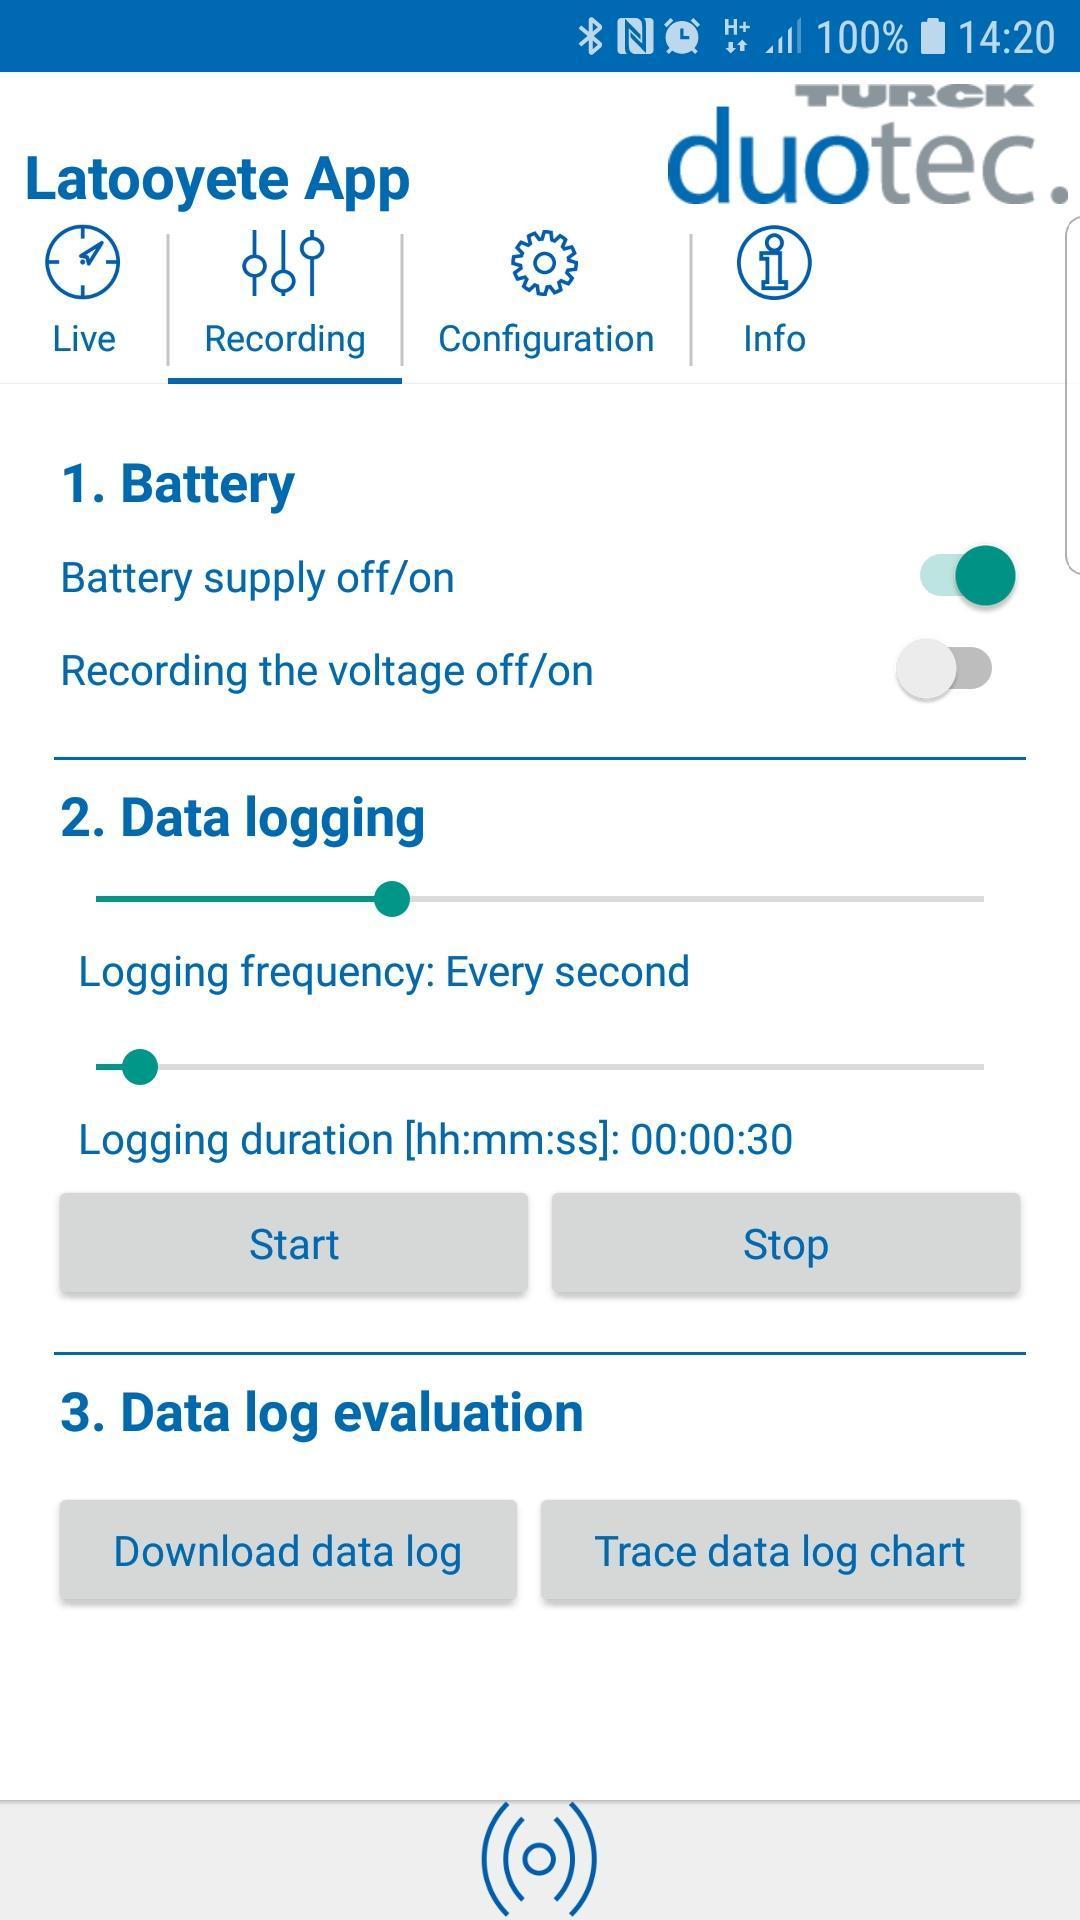 Turck duotec Latooyete App for Android - APK Download